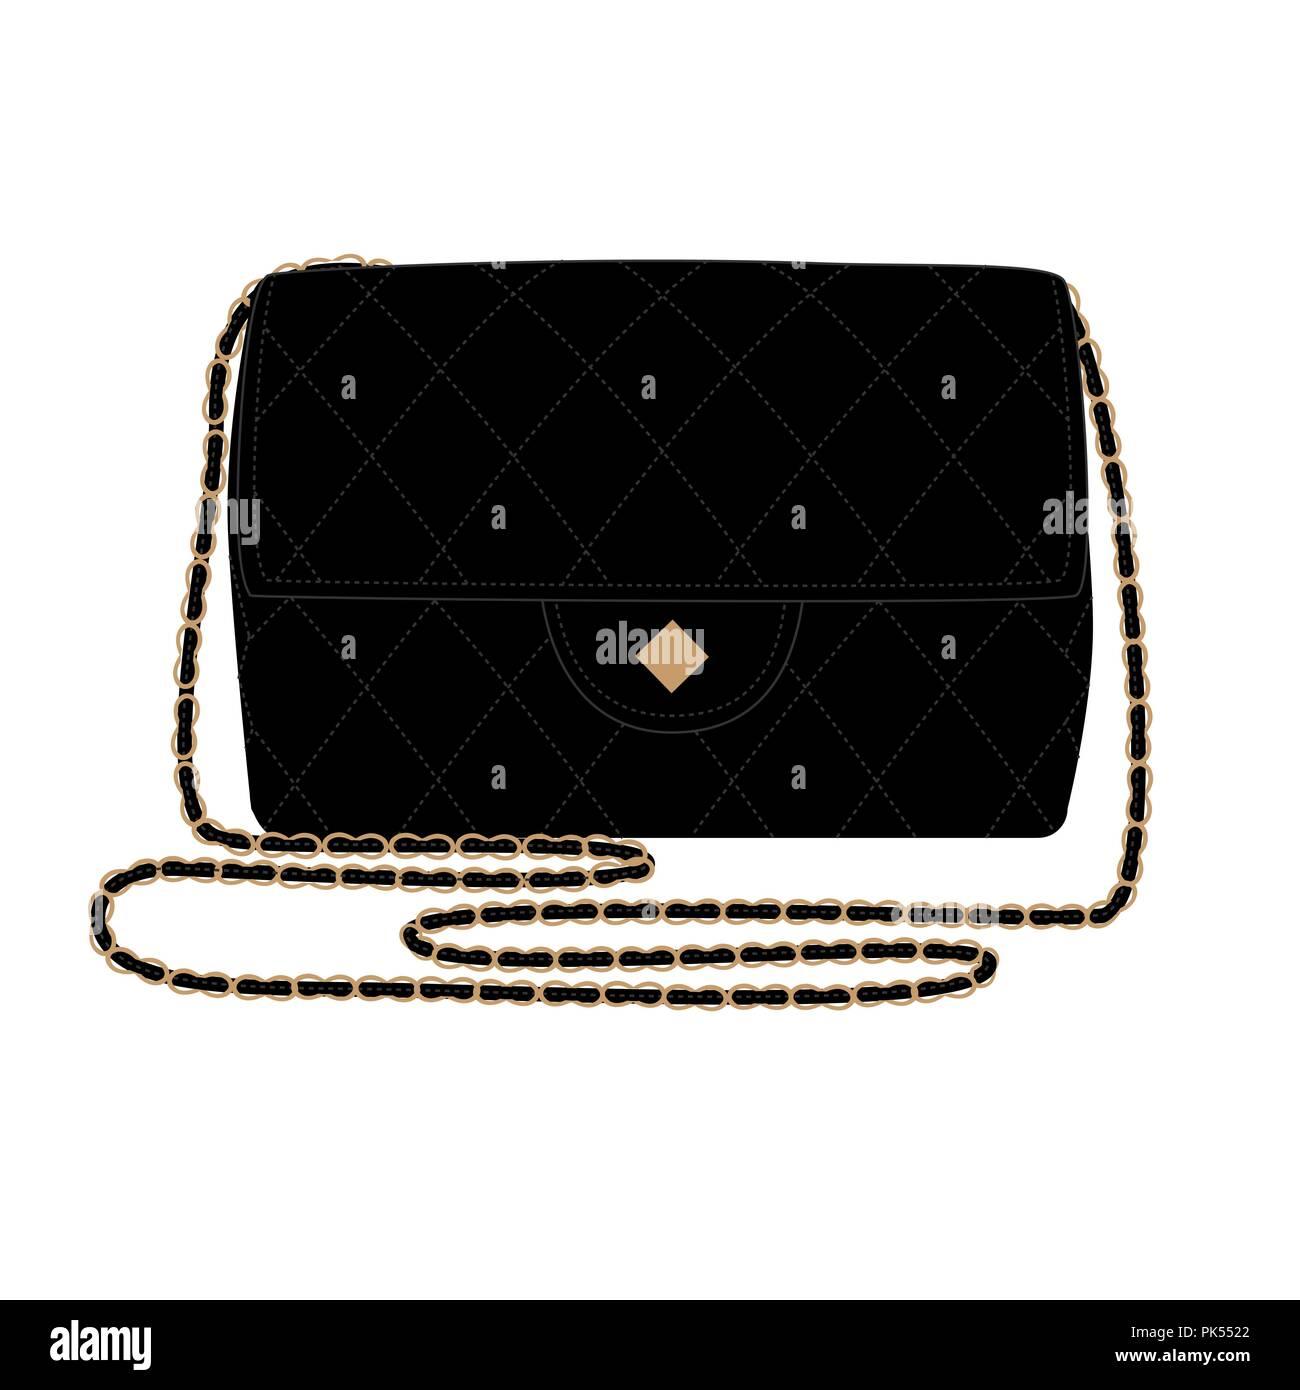 hight resolution of fashion illustration with quilt black handbag chanel bag vector illustration stock image